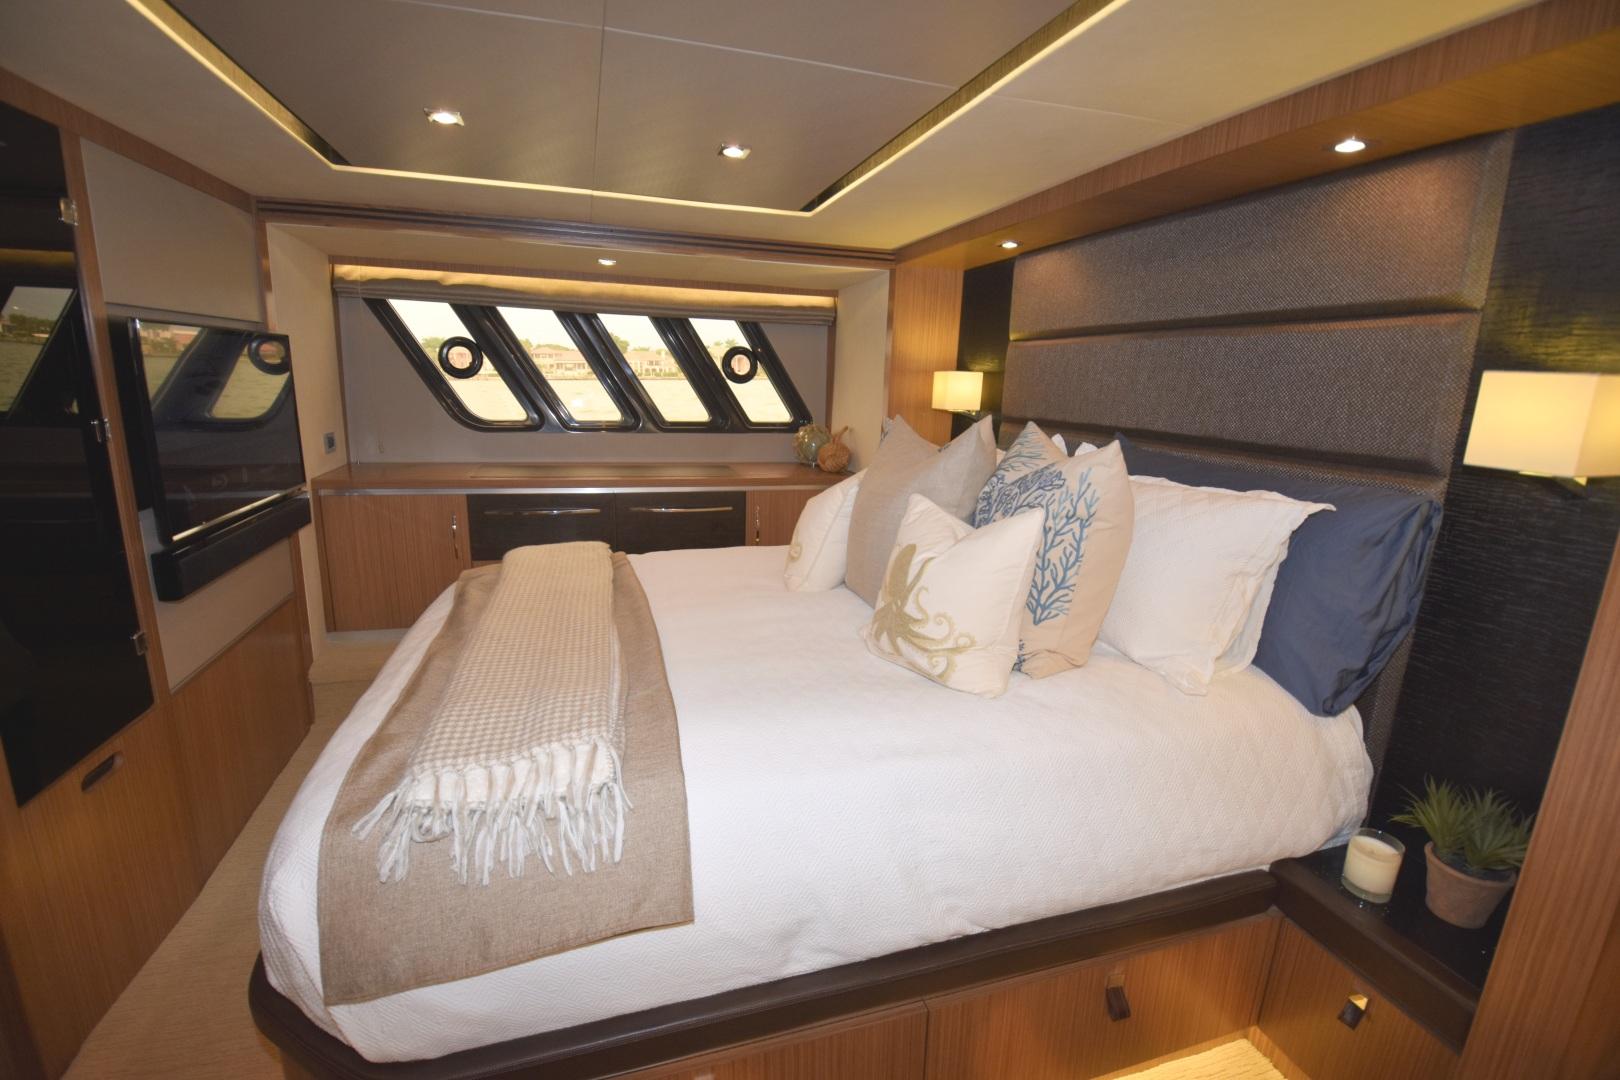 Sea Ray-L650 2016-3x's the Charm Longboat Key-Florida-United States-2016 Sea Ray L650  3x's the Charm  Master Stateroom-1251813 | Thumbnail